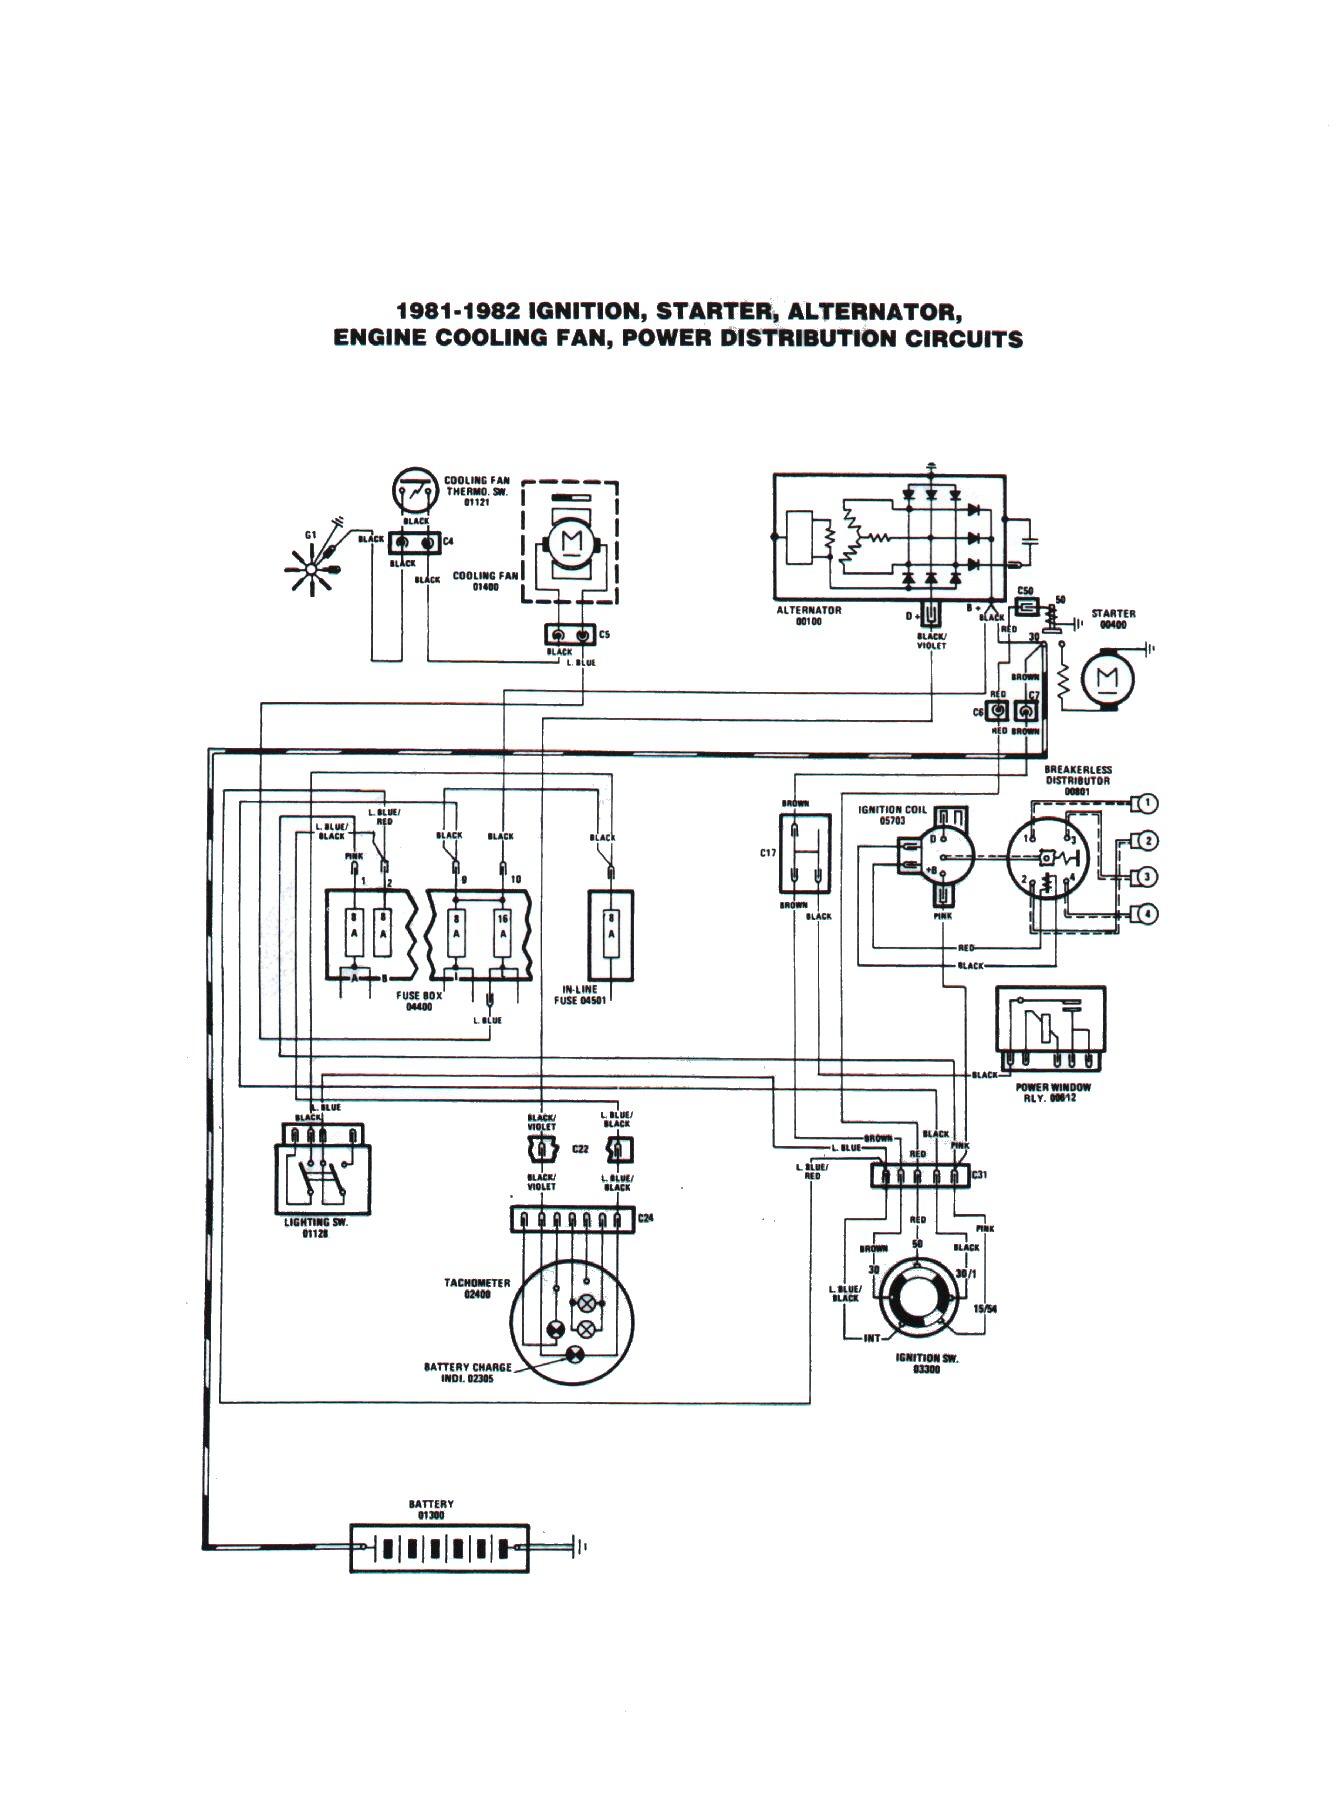 hight resolution of fiat spider 124 wiring diagram manual wiring library rh 86 bloxhuette de 1969 fiat 124 spider 1969 fiat 124 spider